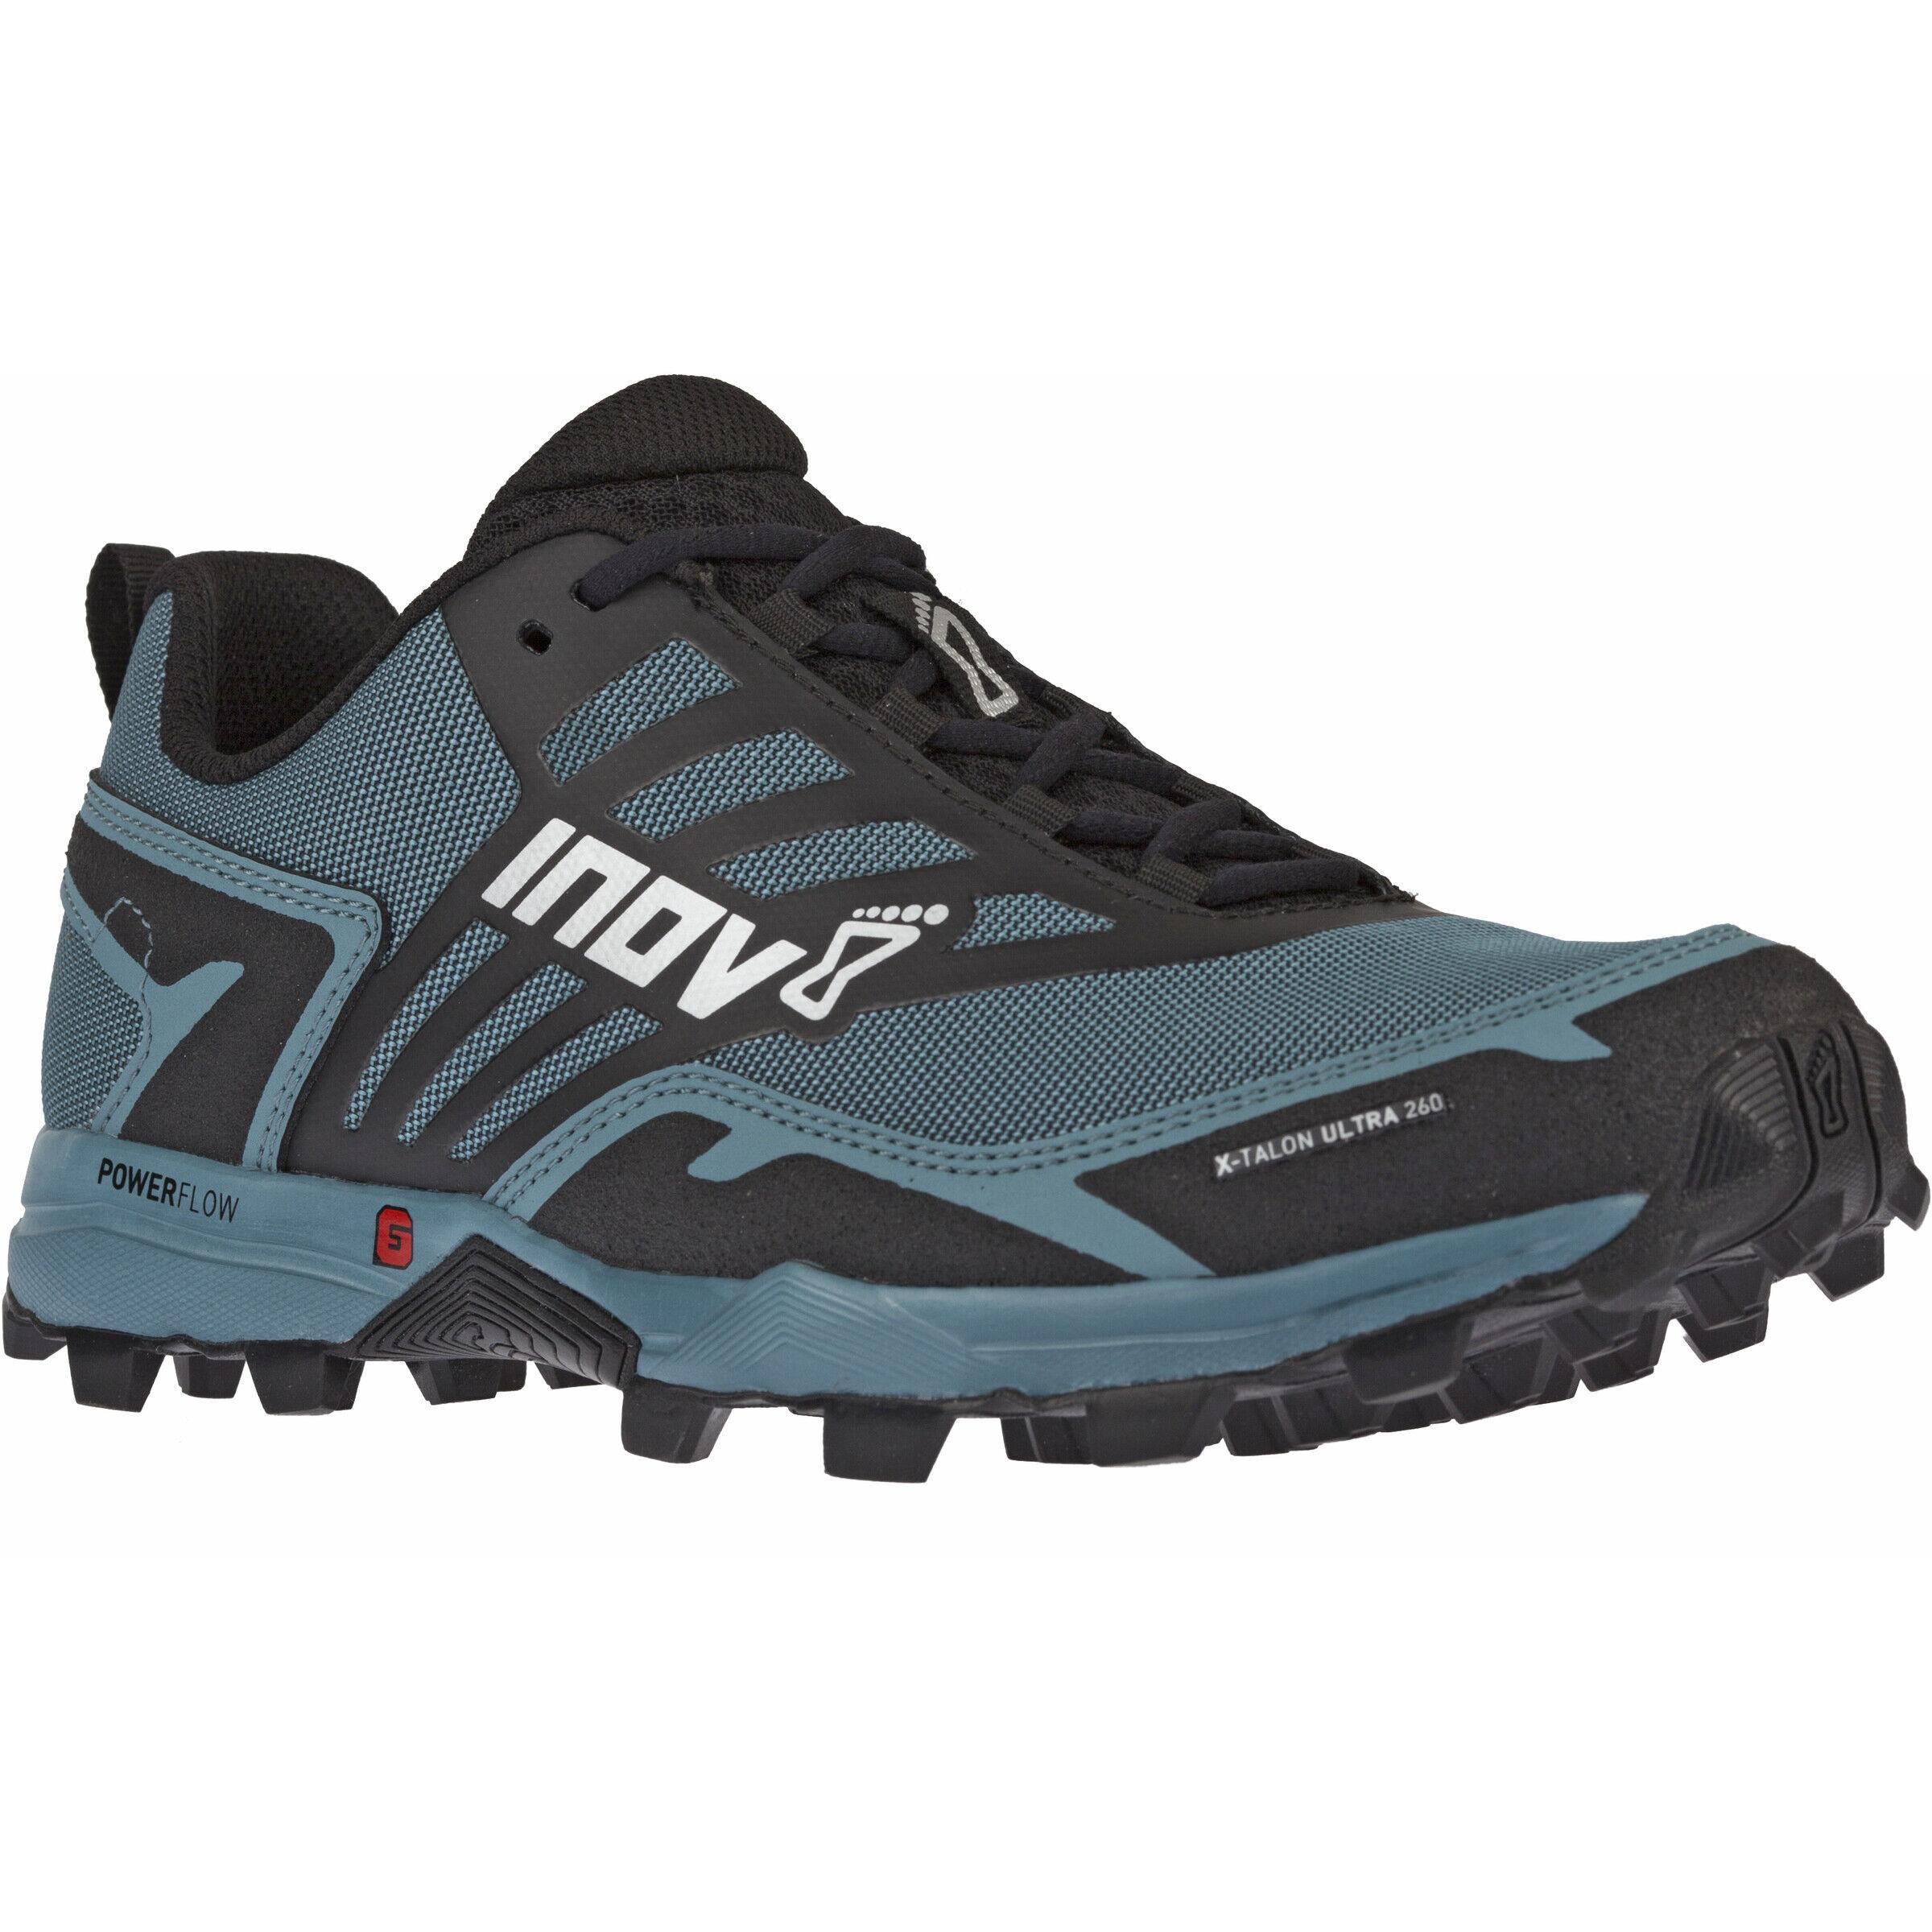 inov 8 Trailroc G 280 Shoes Dam purpleblack